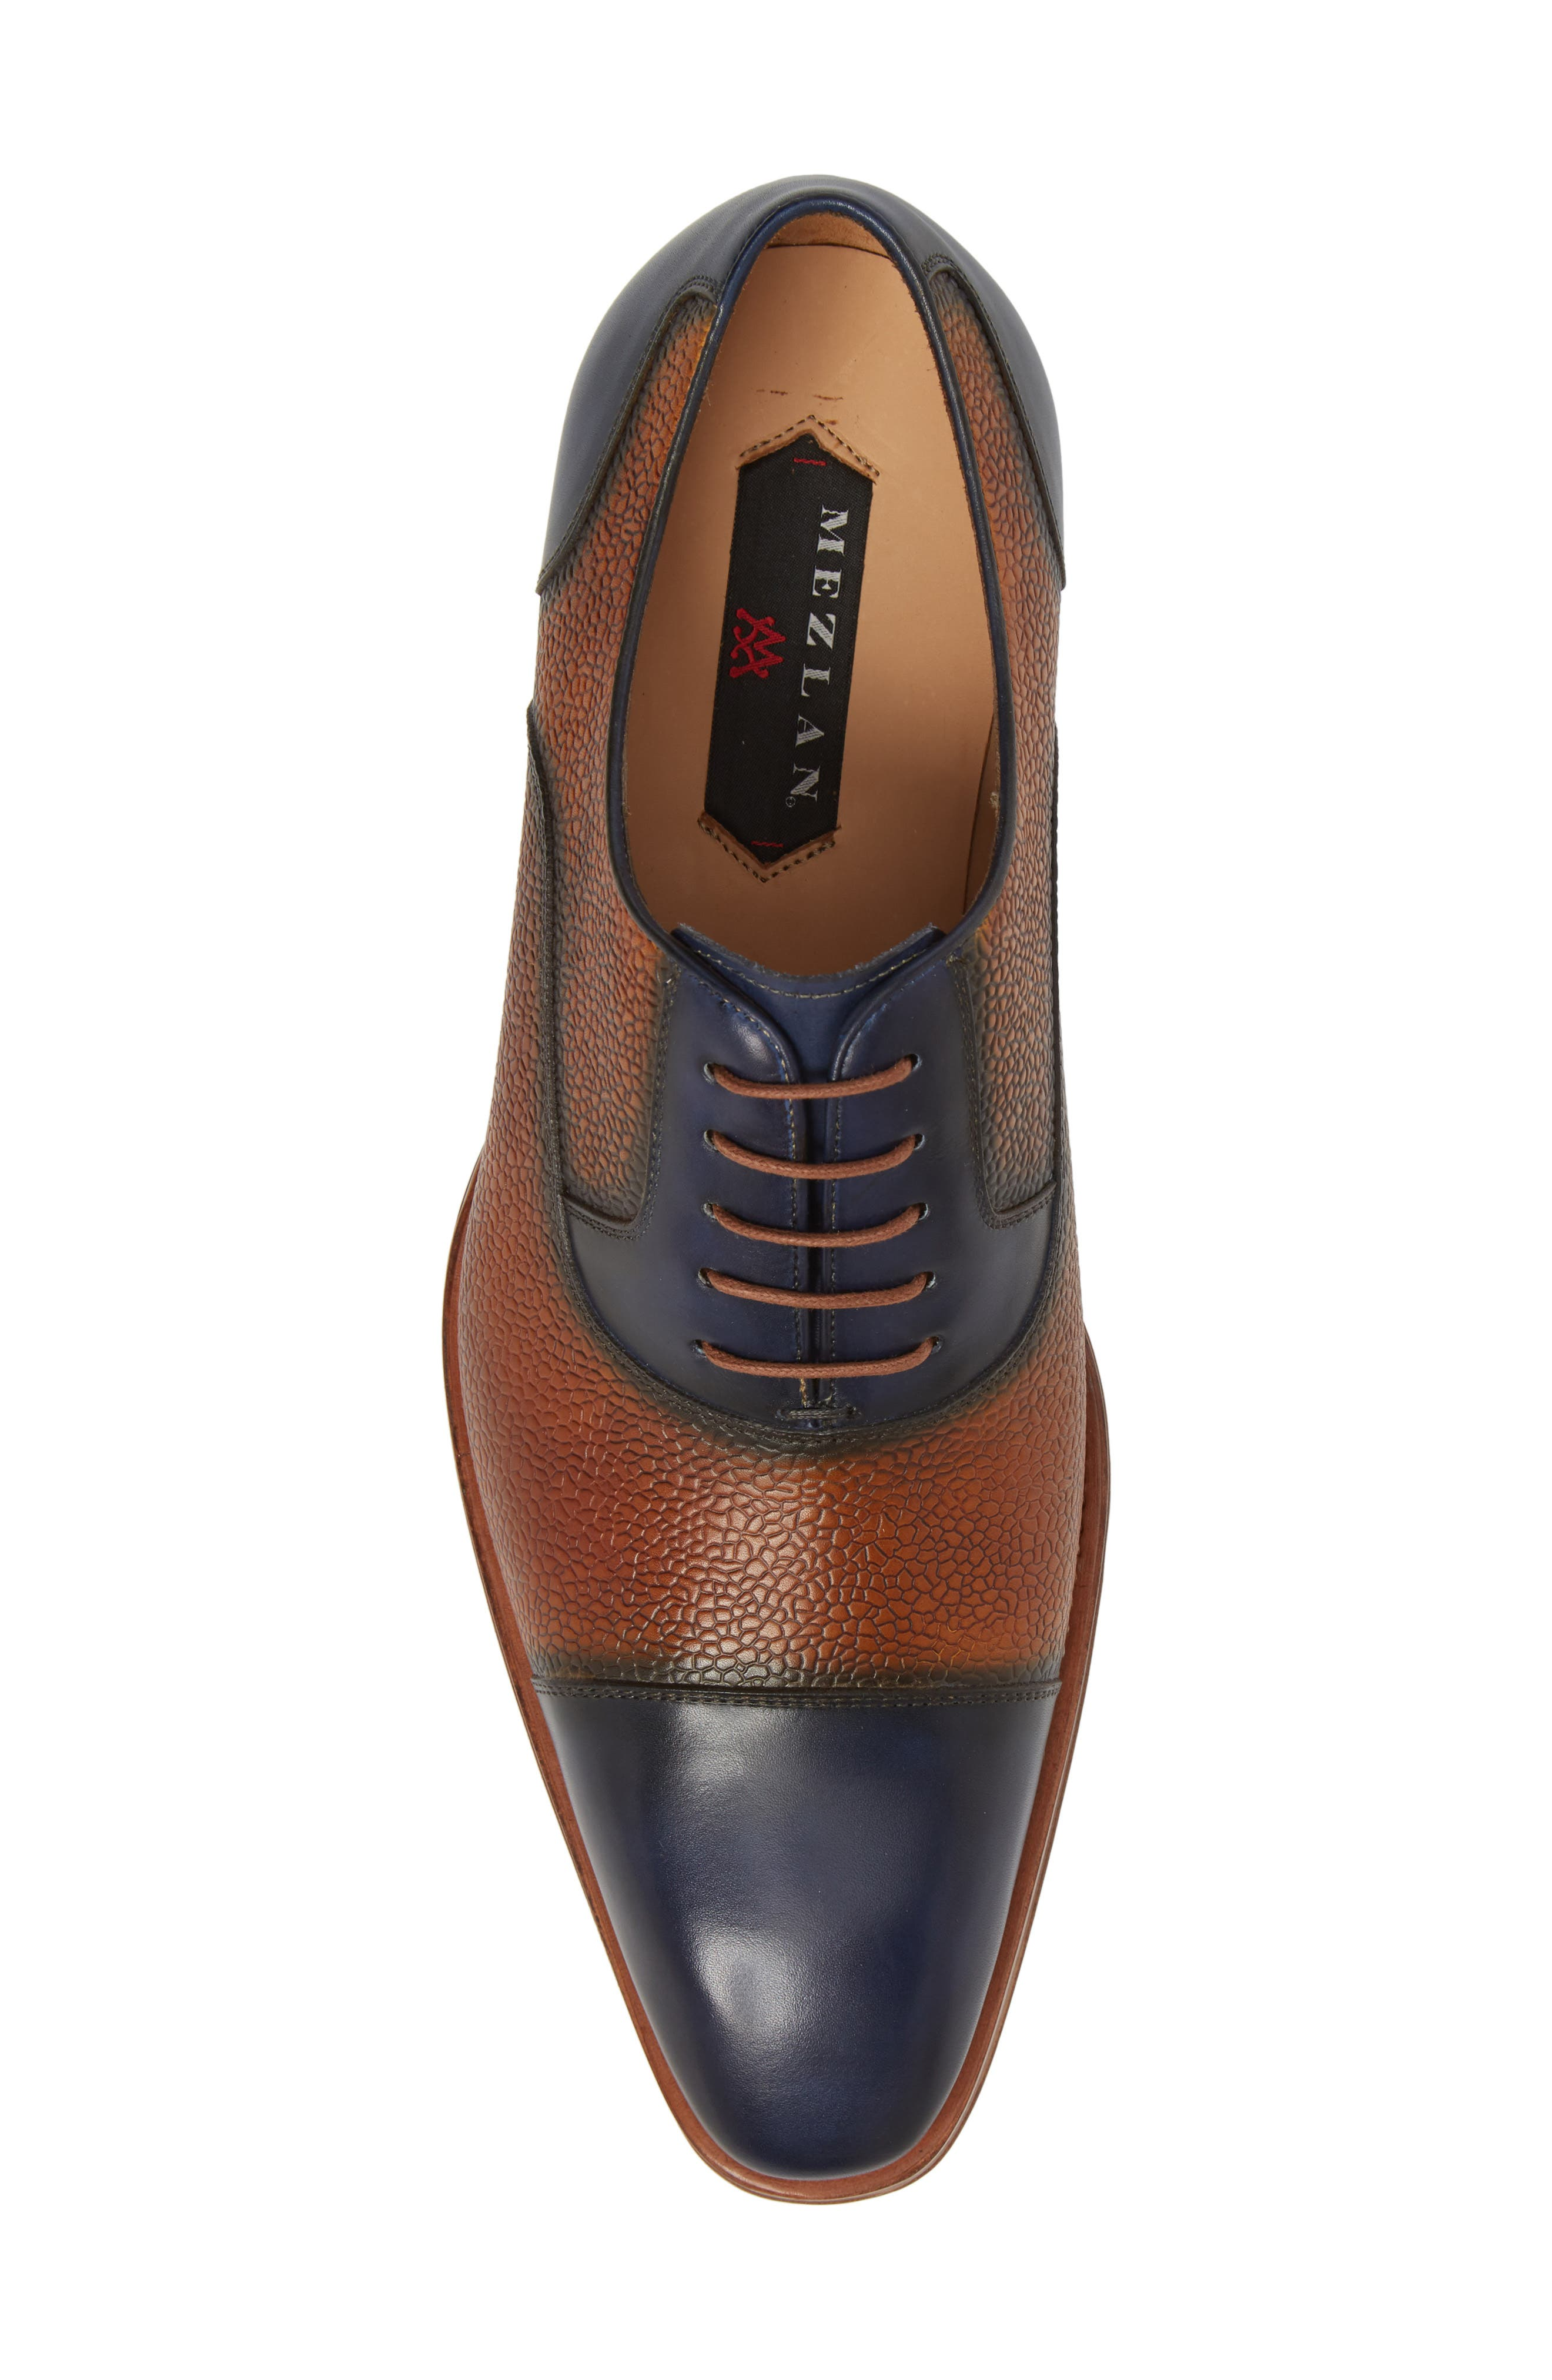 Verino Cap Toe Oxford,                             Alternate thumbnail 5, color,                             Blue/ Tan Leather